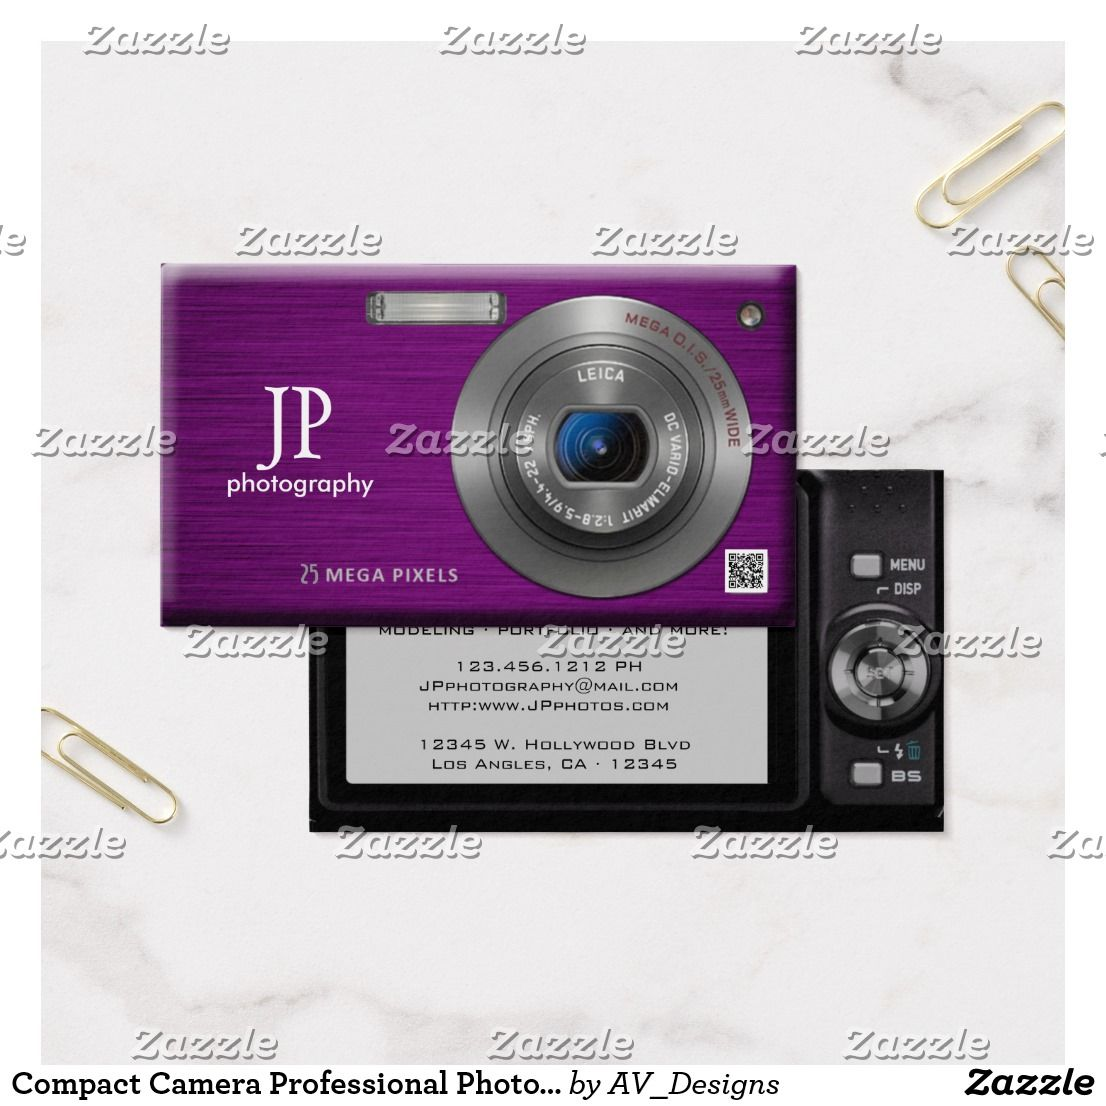 Compact camera professional photographer qr code business